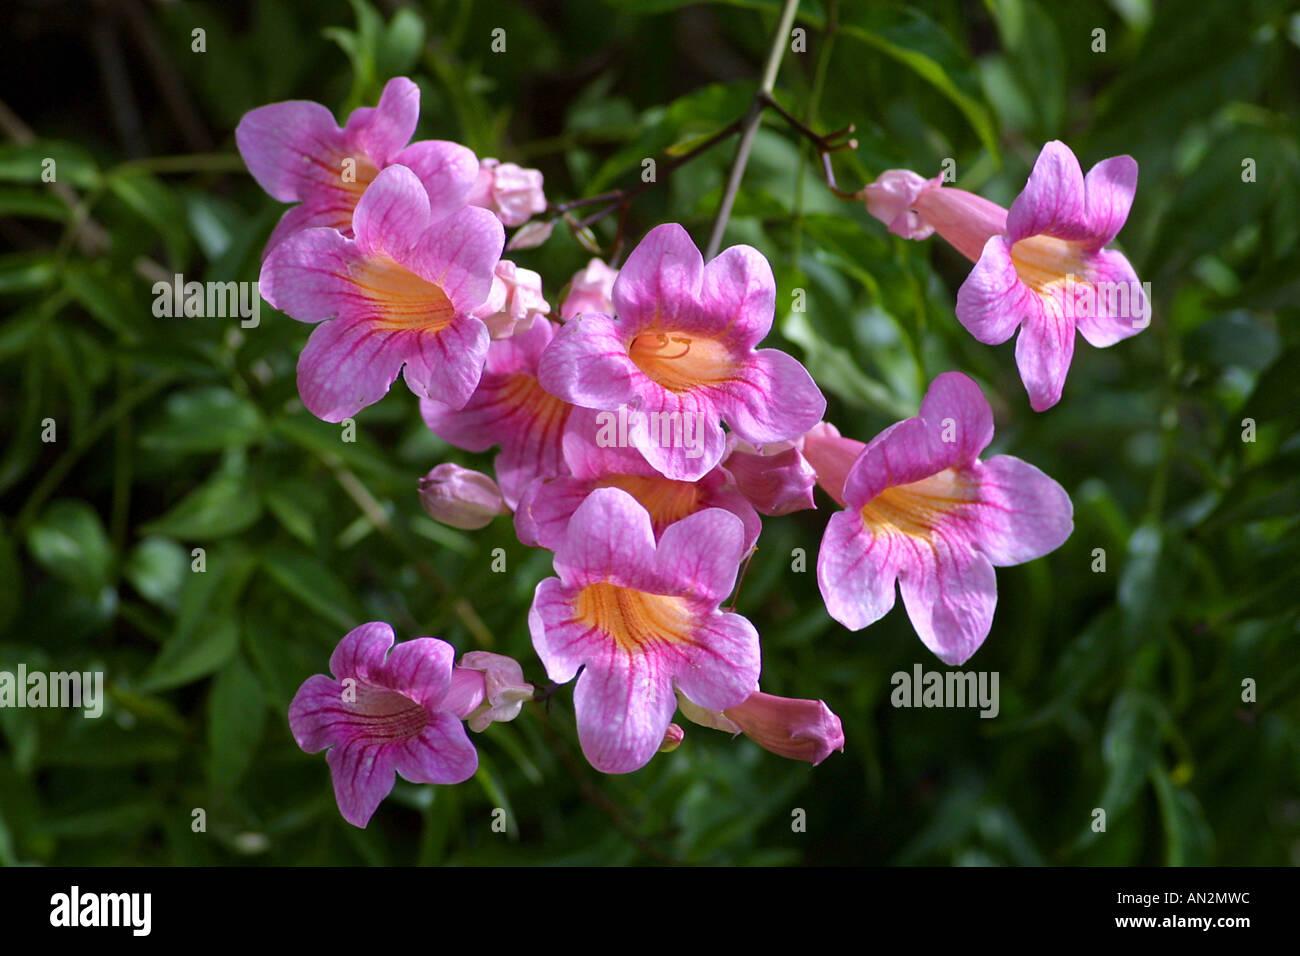 Podranea Pink Trumpet Vine Bignone Rose Podranea Ricasoliana